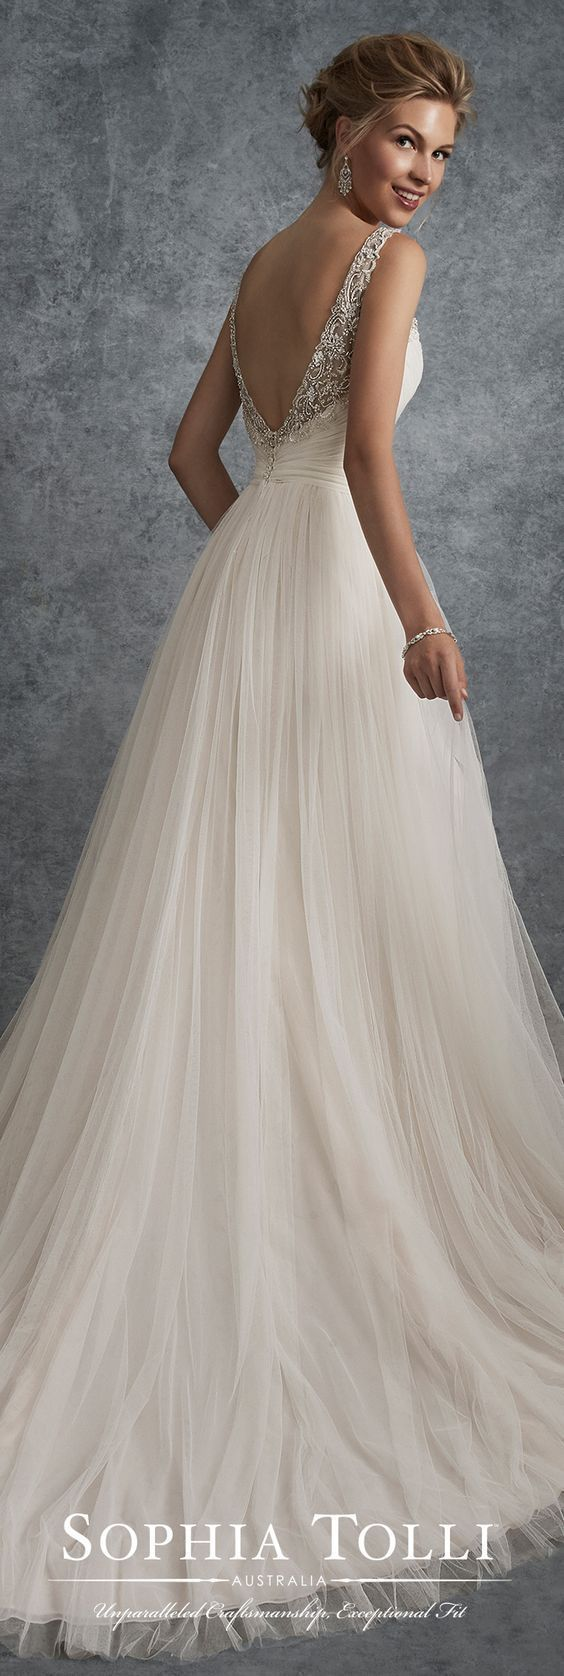 Big pretty wedding dresses  Featured Dress Sophia Tolli Wedding dress idea weddingdresses